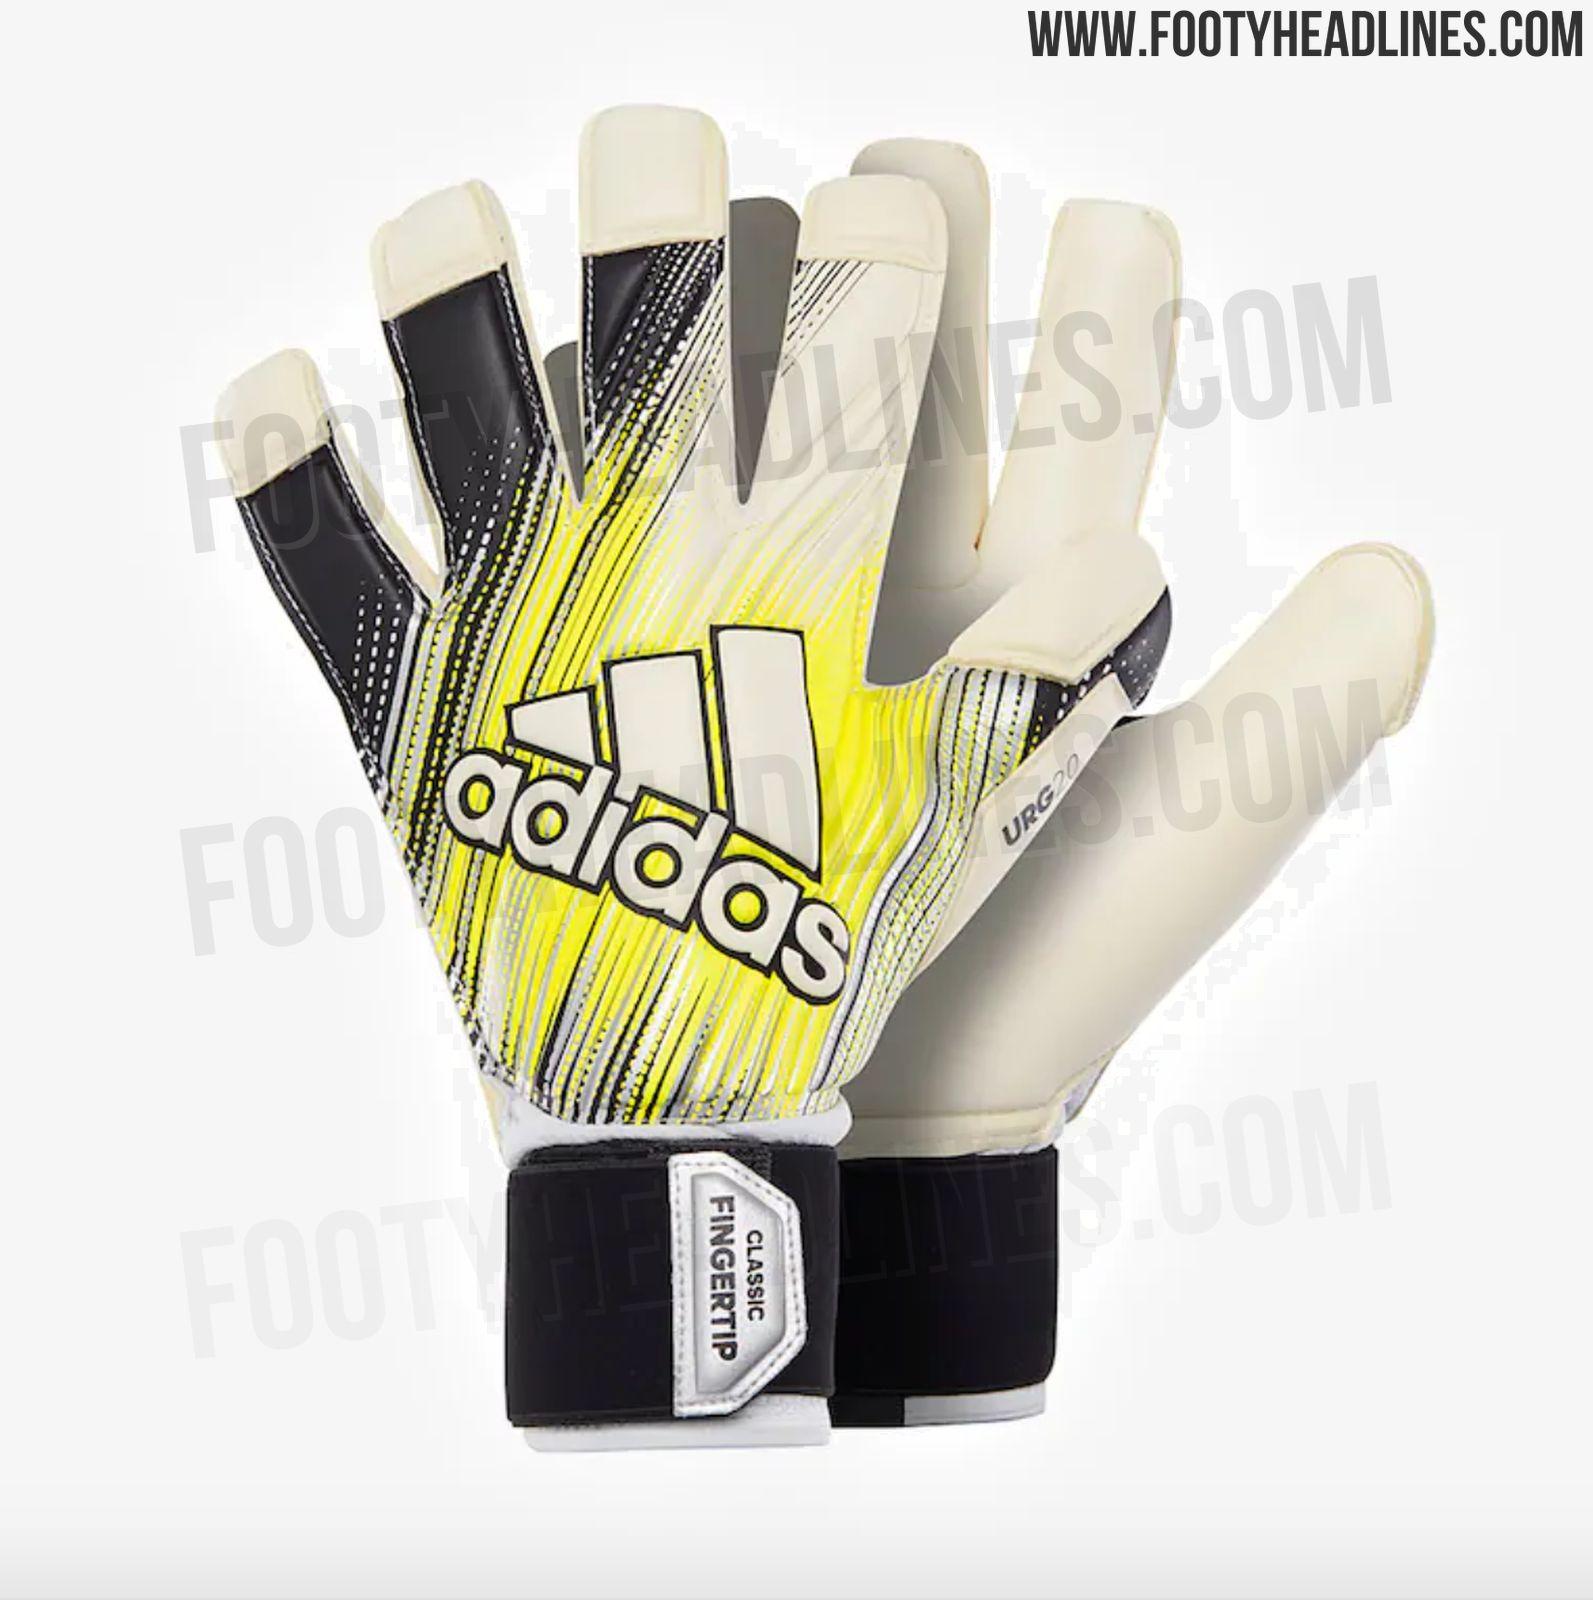 88b14de63 Adidas Classic Pro 'Iker Casillas' Goalkeeper Gloves - Black / Solar Yellow  / White